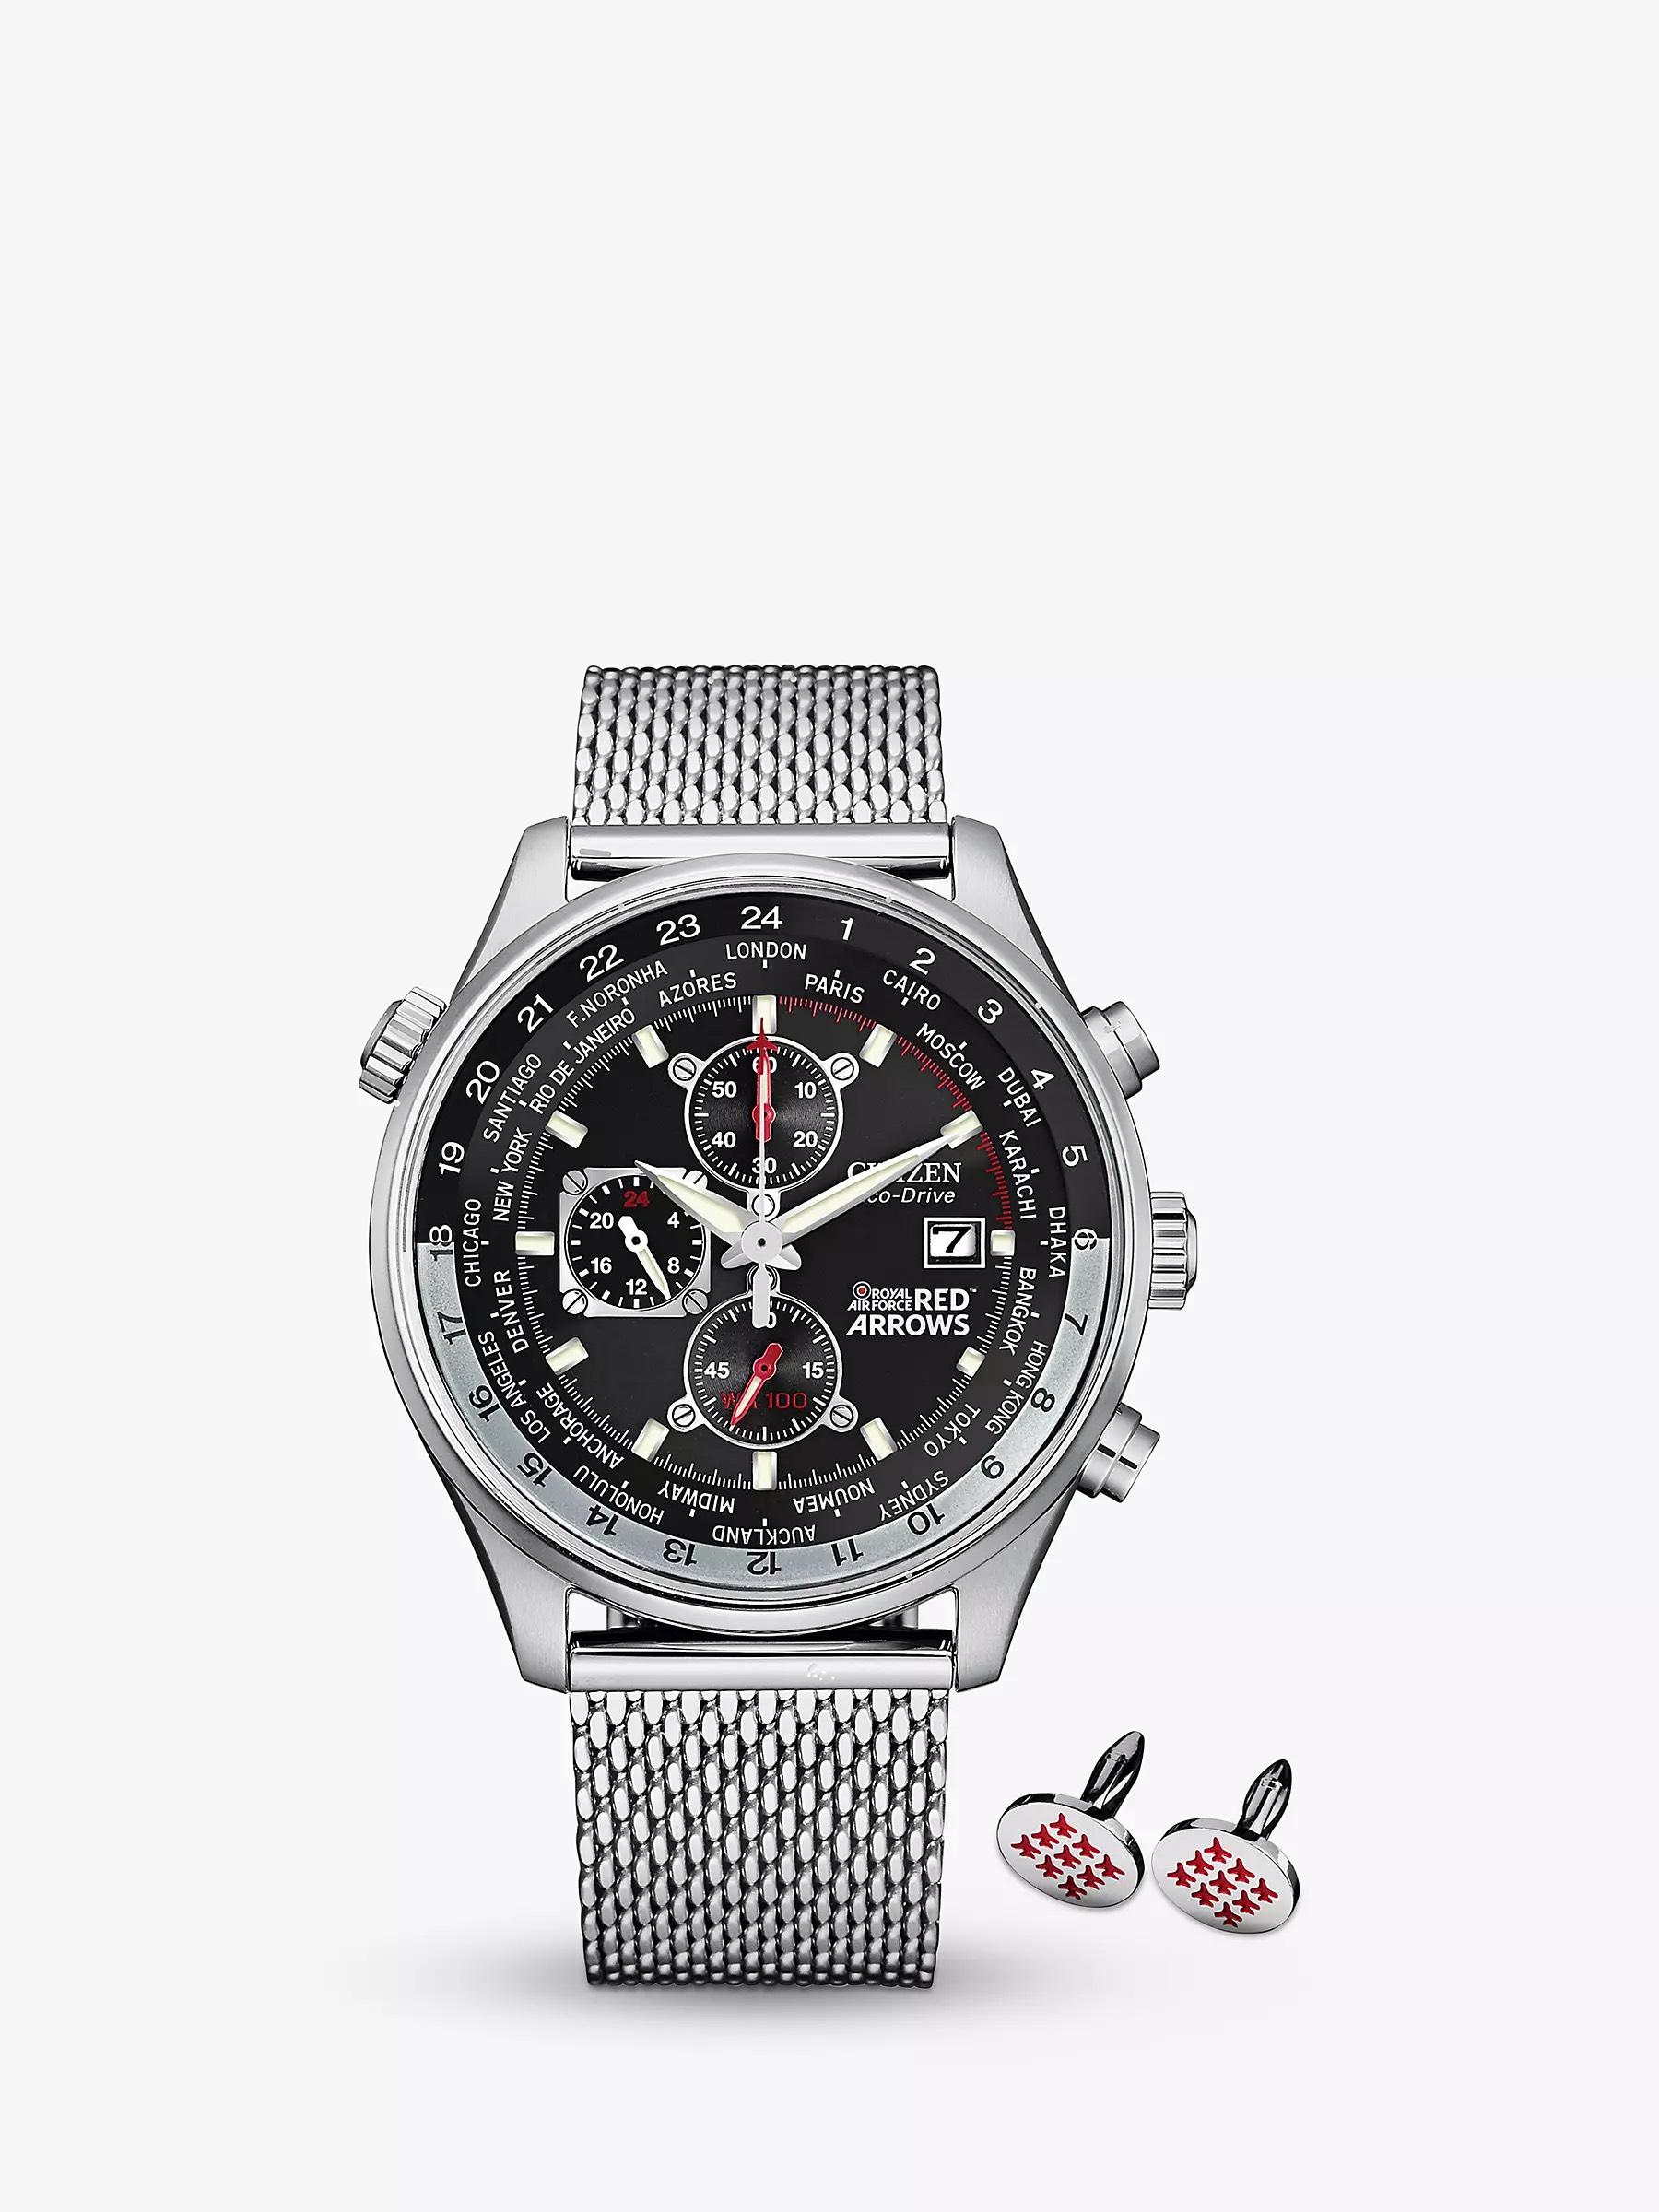 Citizen Eco-Drive Red Arrows Chronograph Watch & Cufflinks Gift Set - £179 @ H Samuel